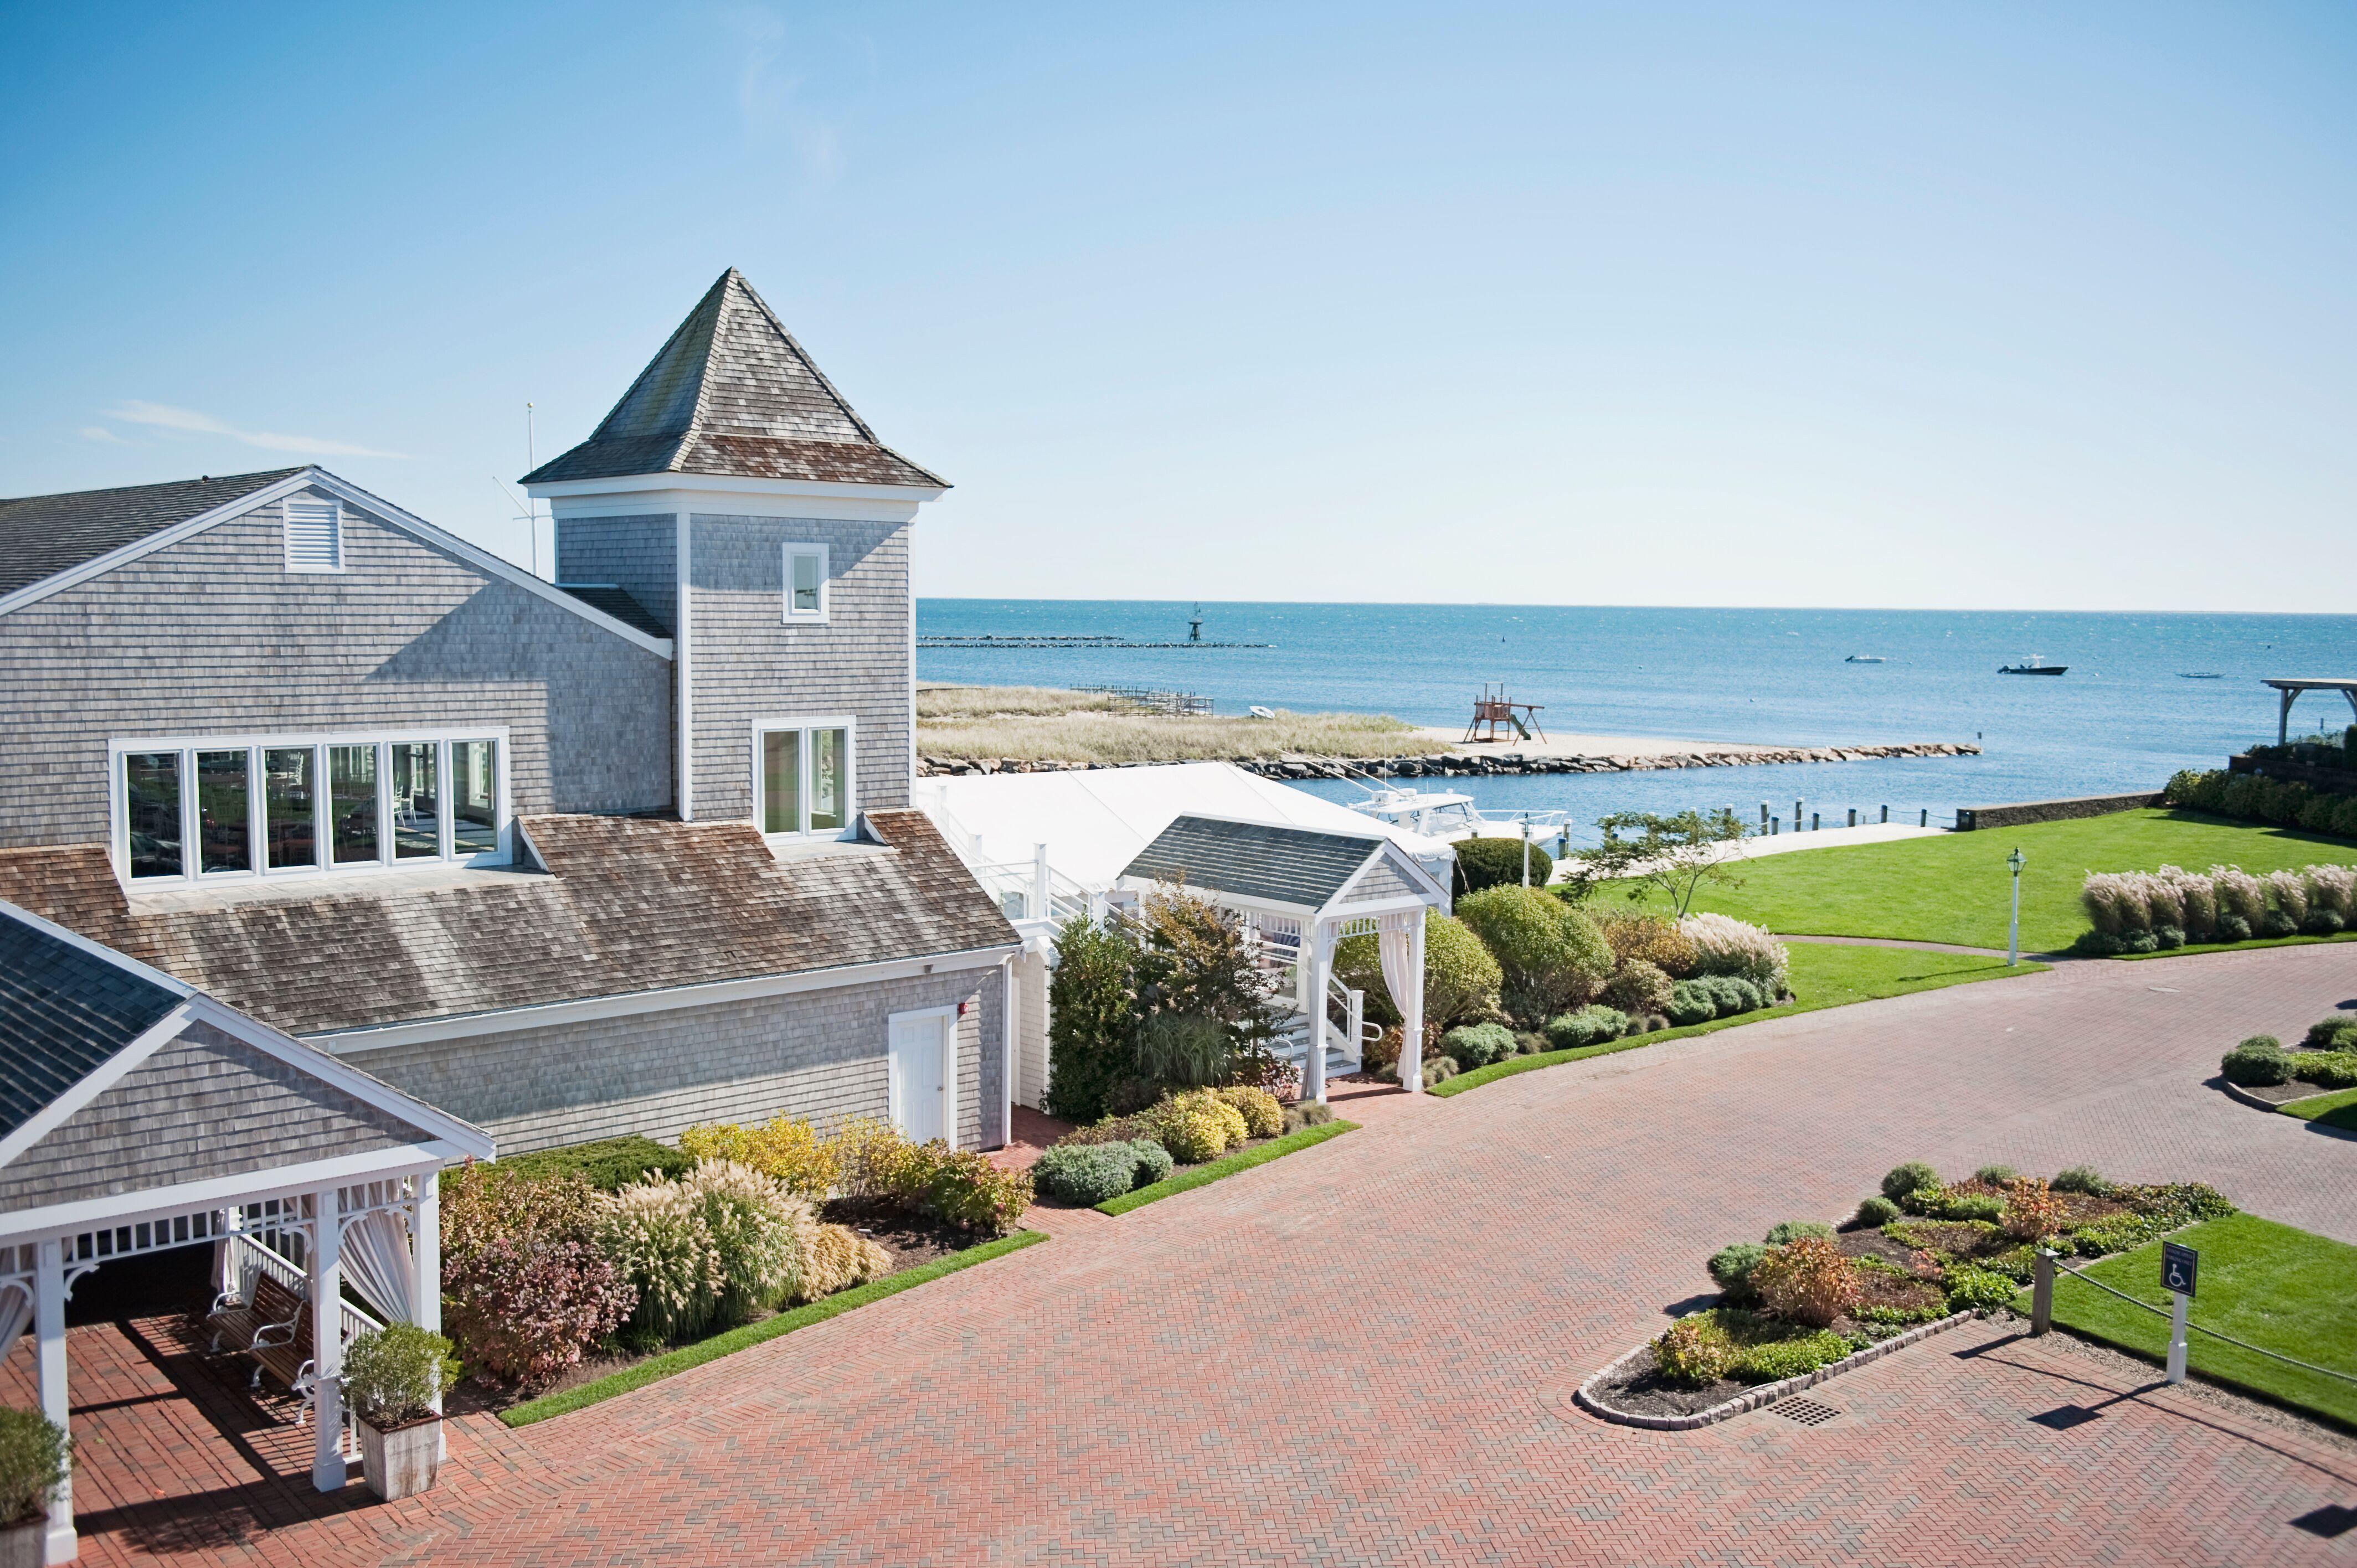 Wychmere Beach Club In Harwich Port Massachusetts